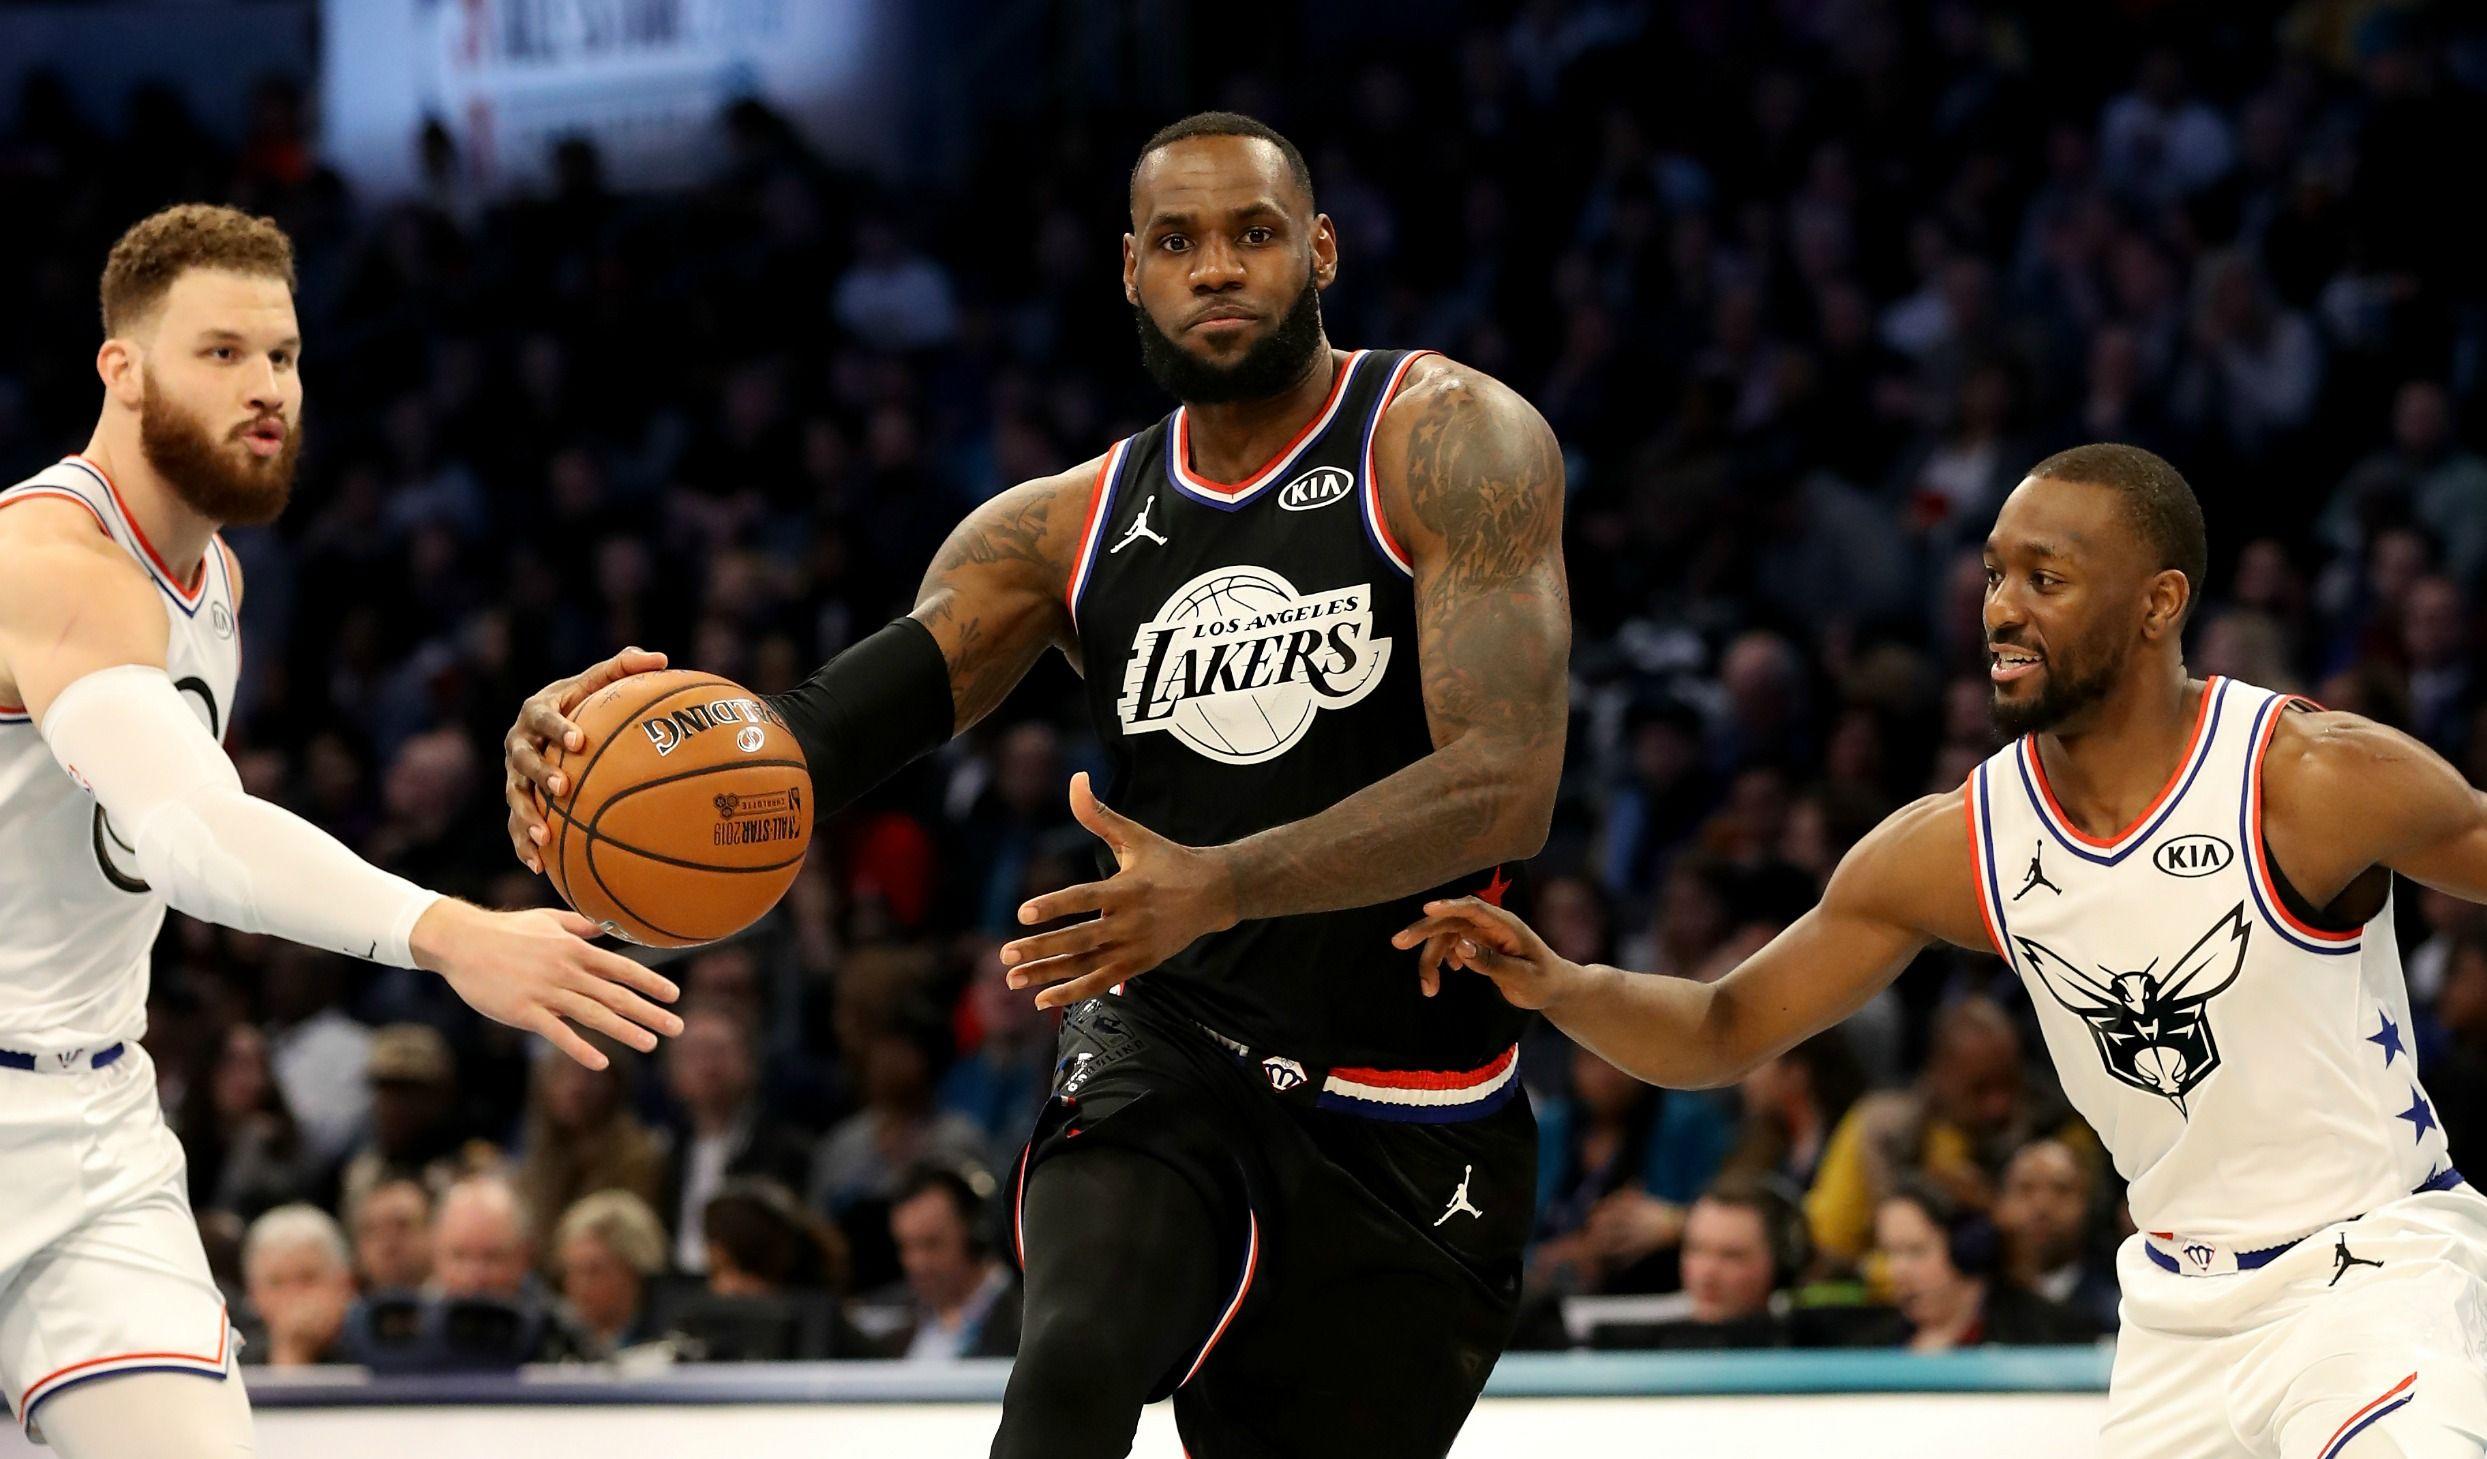 Los Angeles Lakers 3 Reasons Why La Will Win The 2020 Nba Championship In 2020 Lebron James Nba Championships Nba